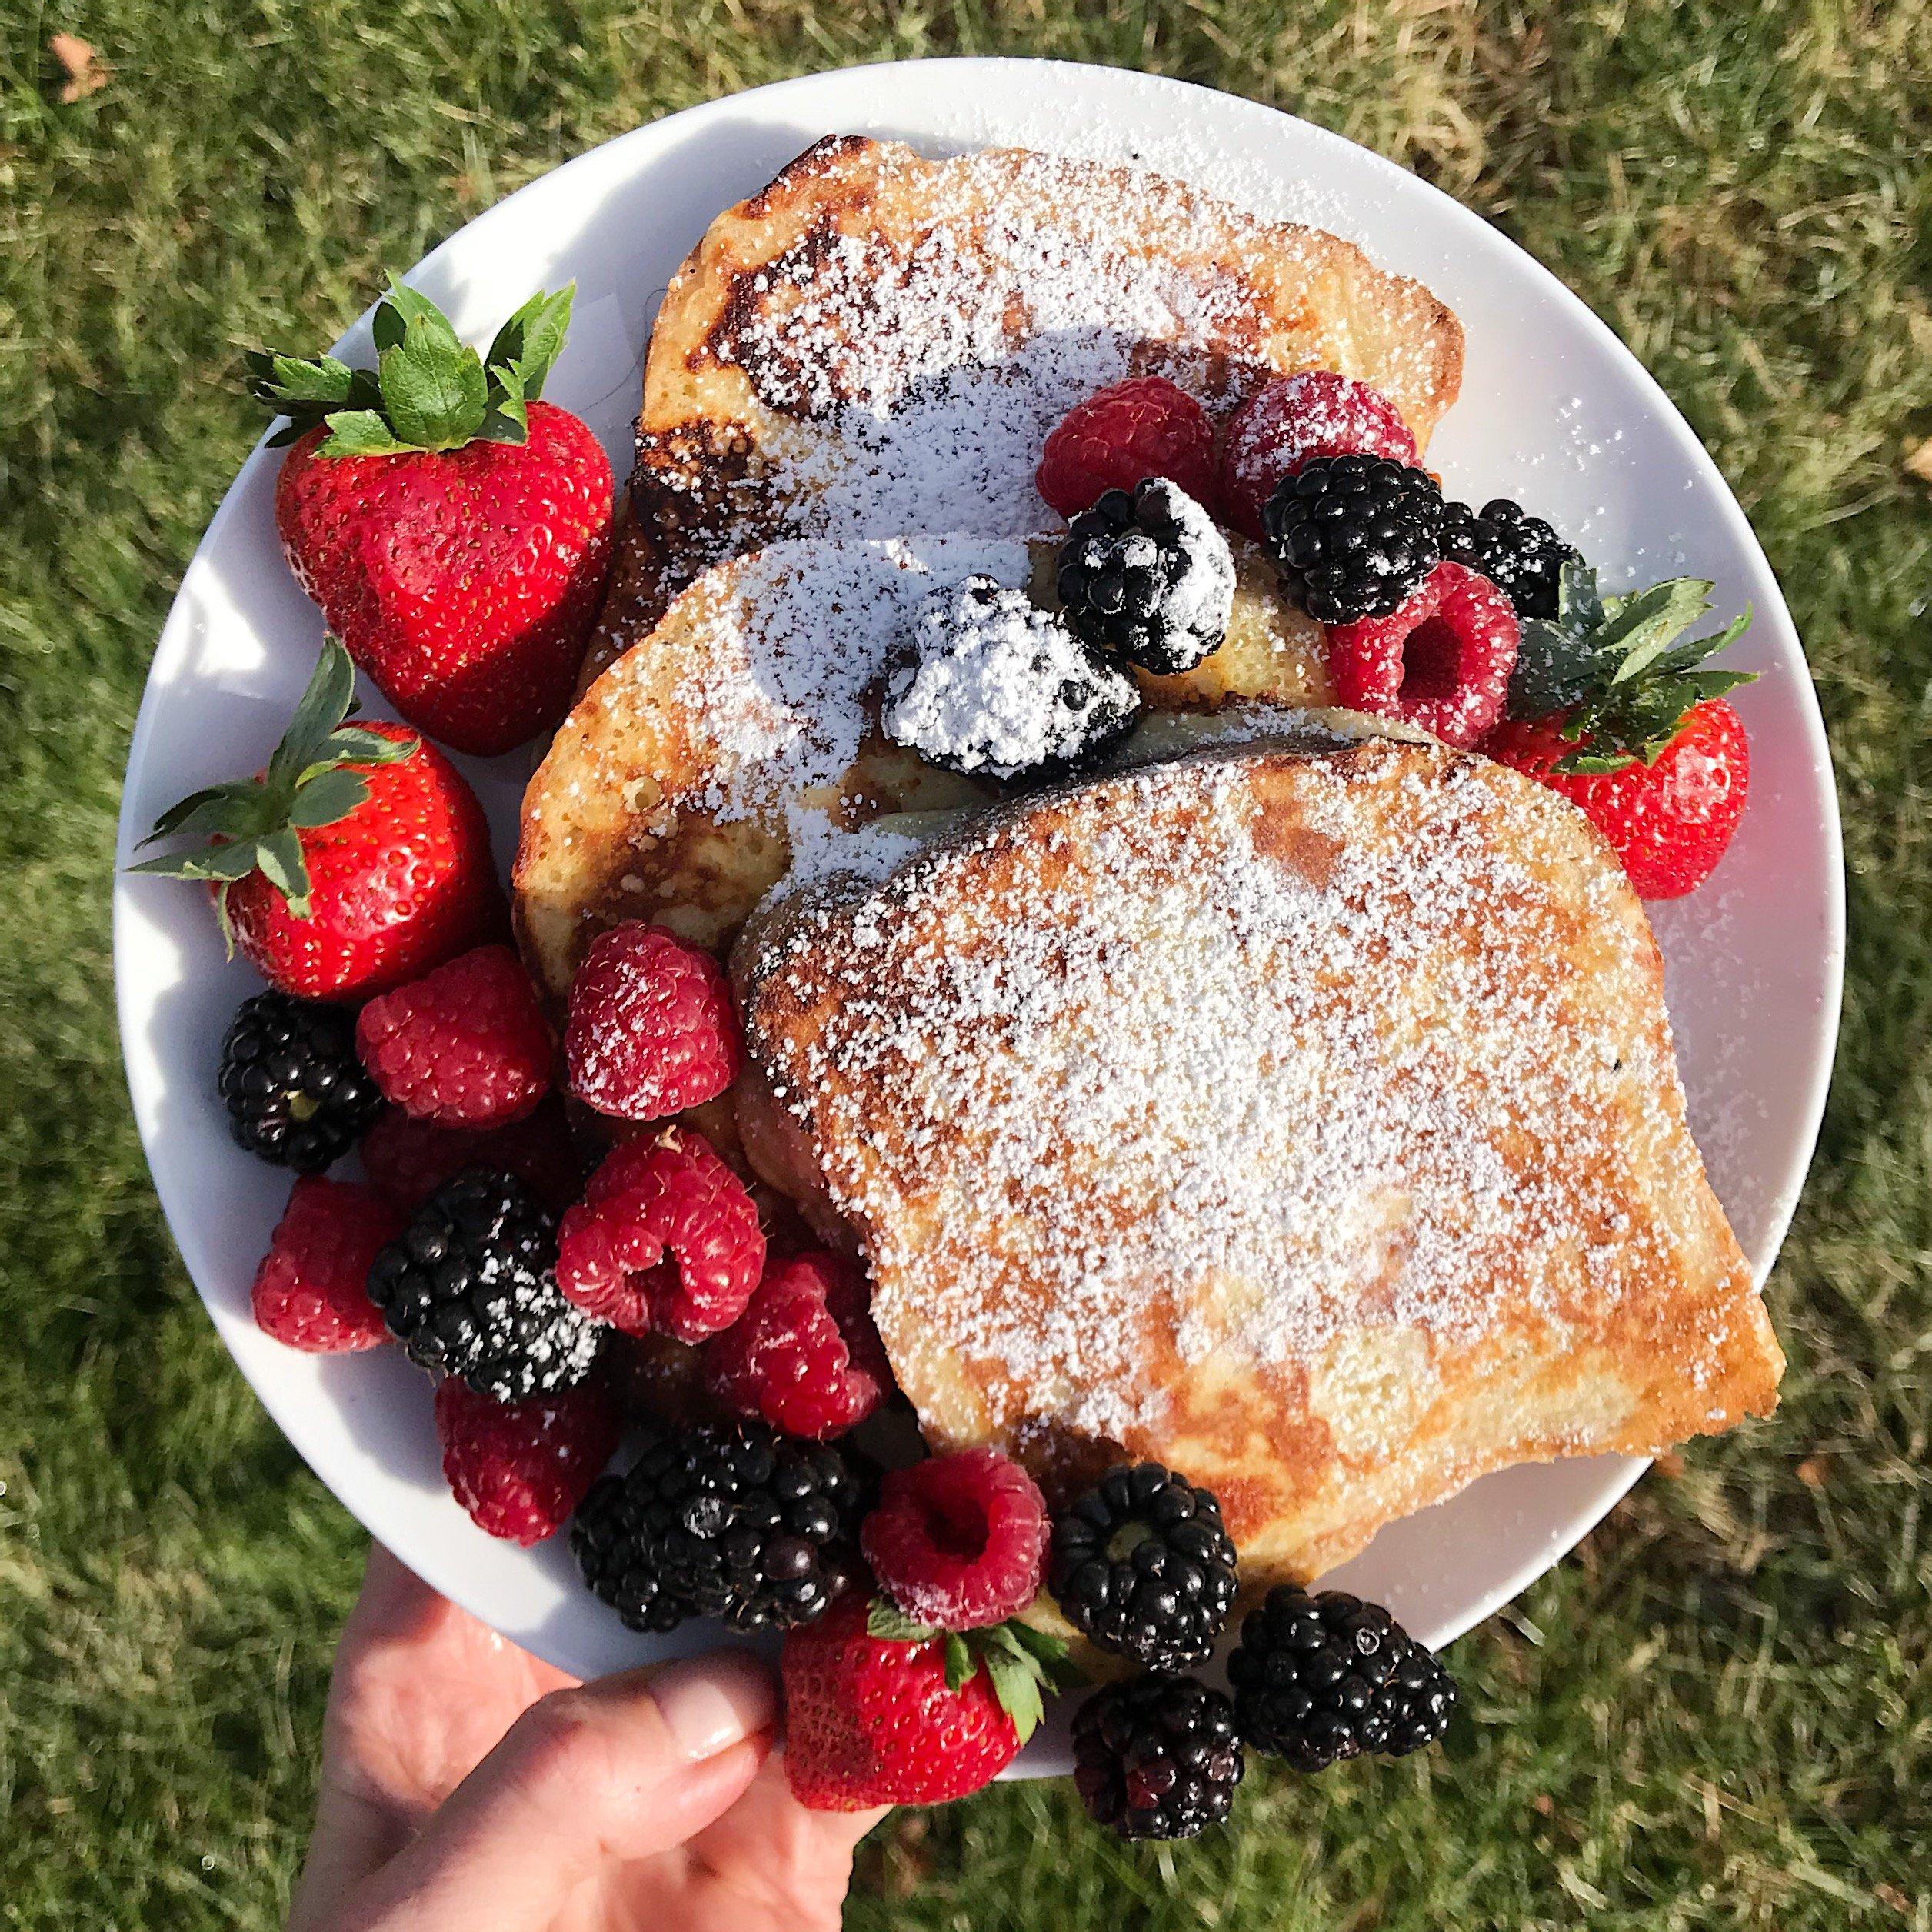 easy gluten free french toast #glutenfreerecipes www.healthygffamily.com